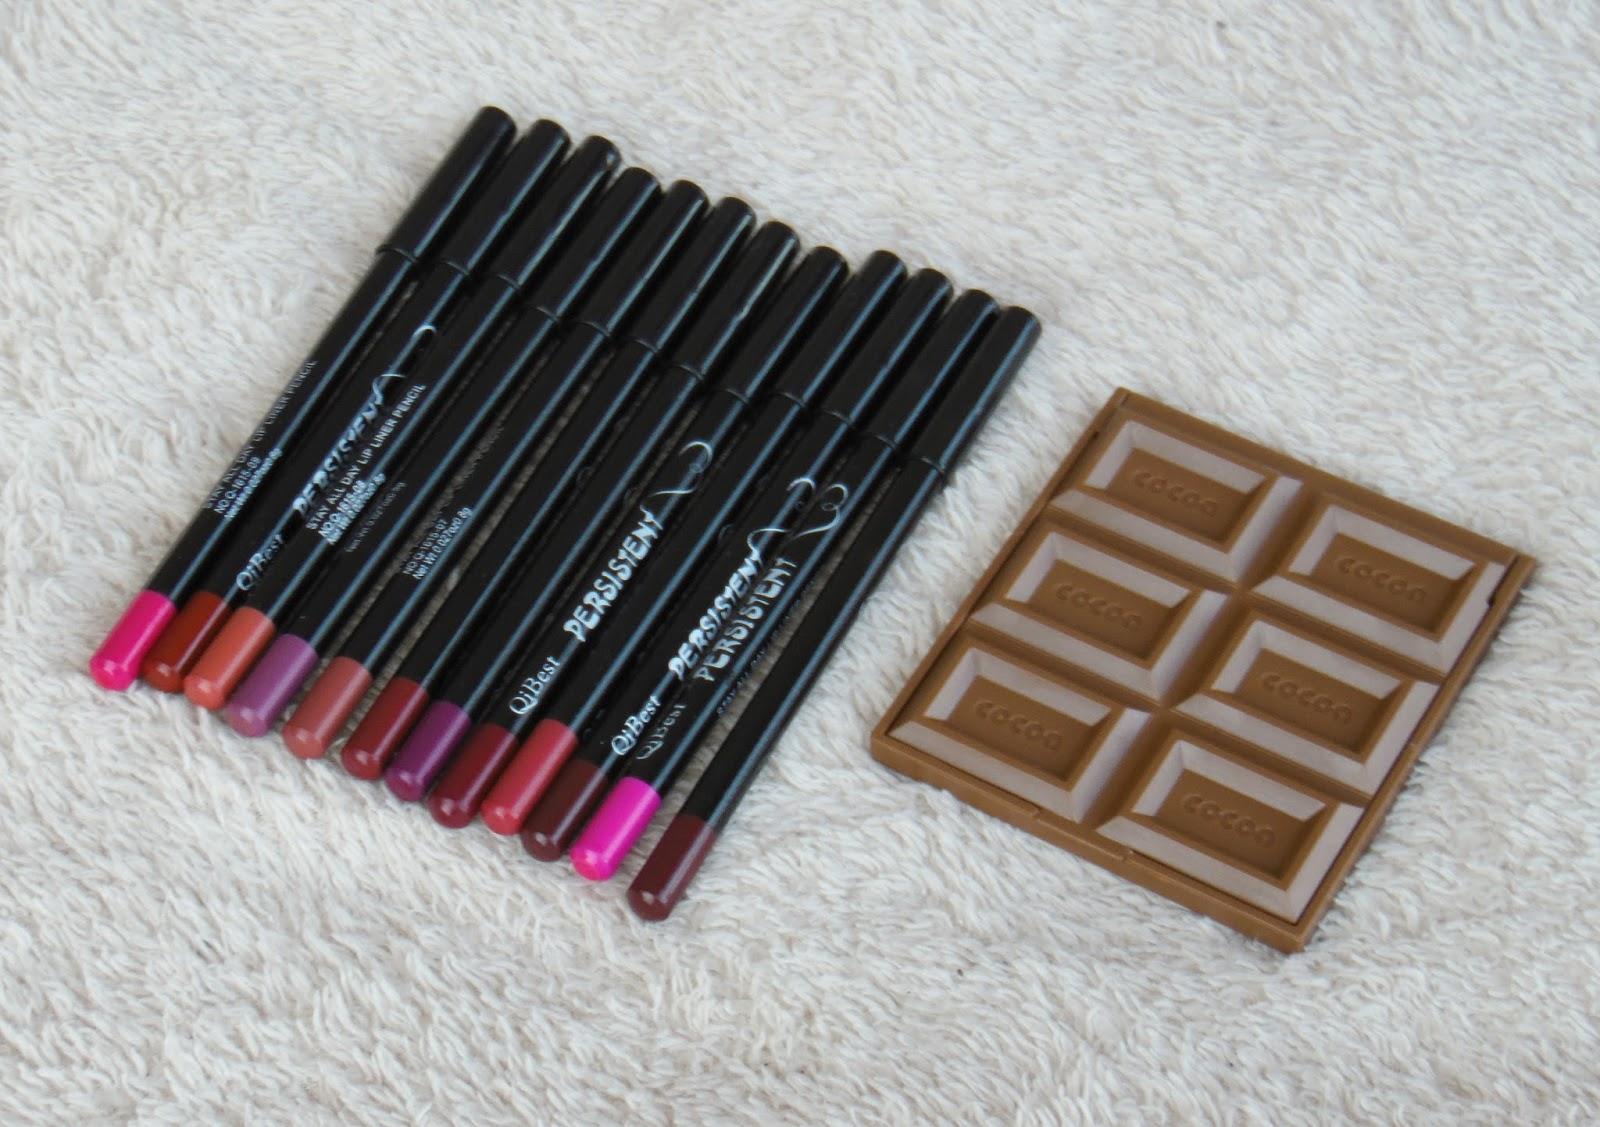 Nove stvarčice [Essence, Aura, Catrice] - Candy Makeup Girl